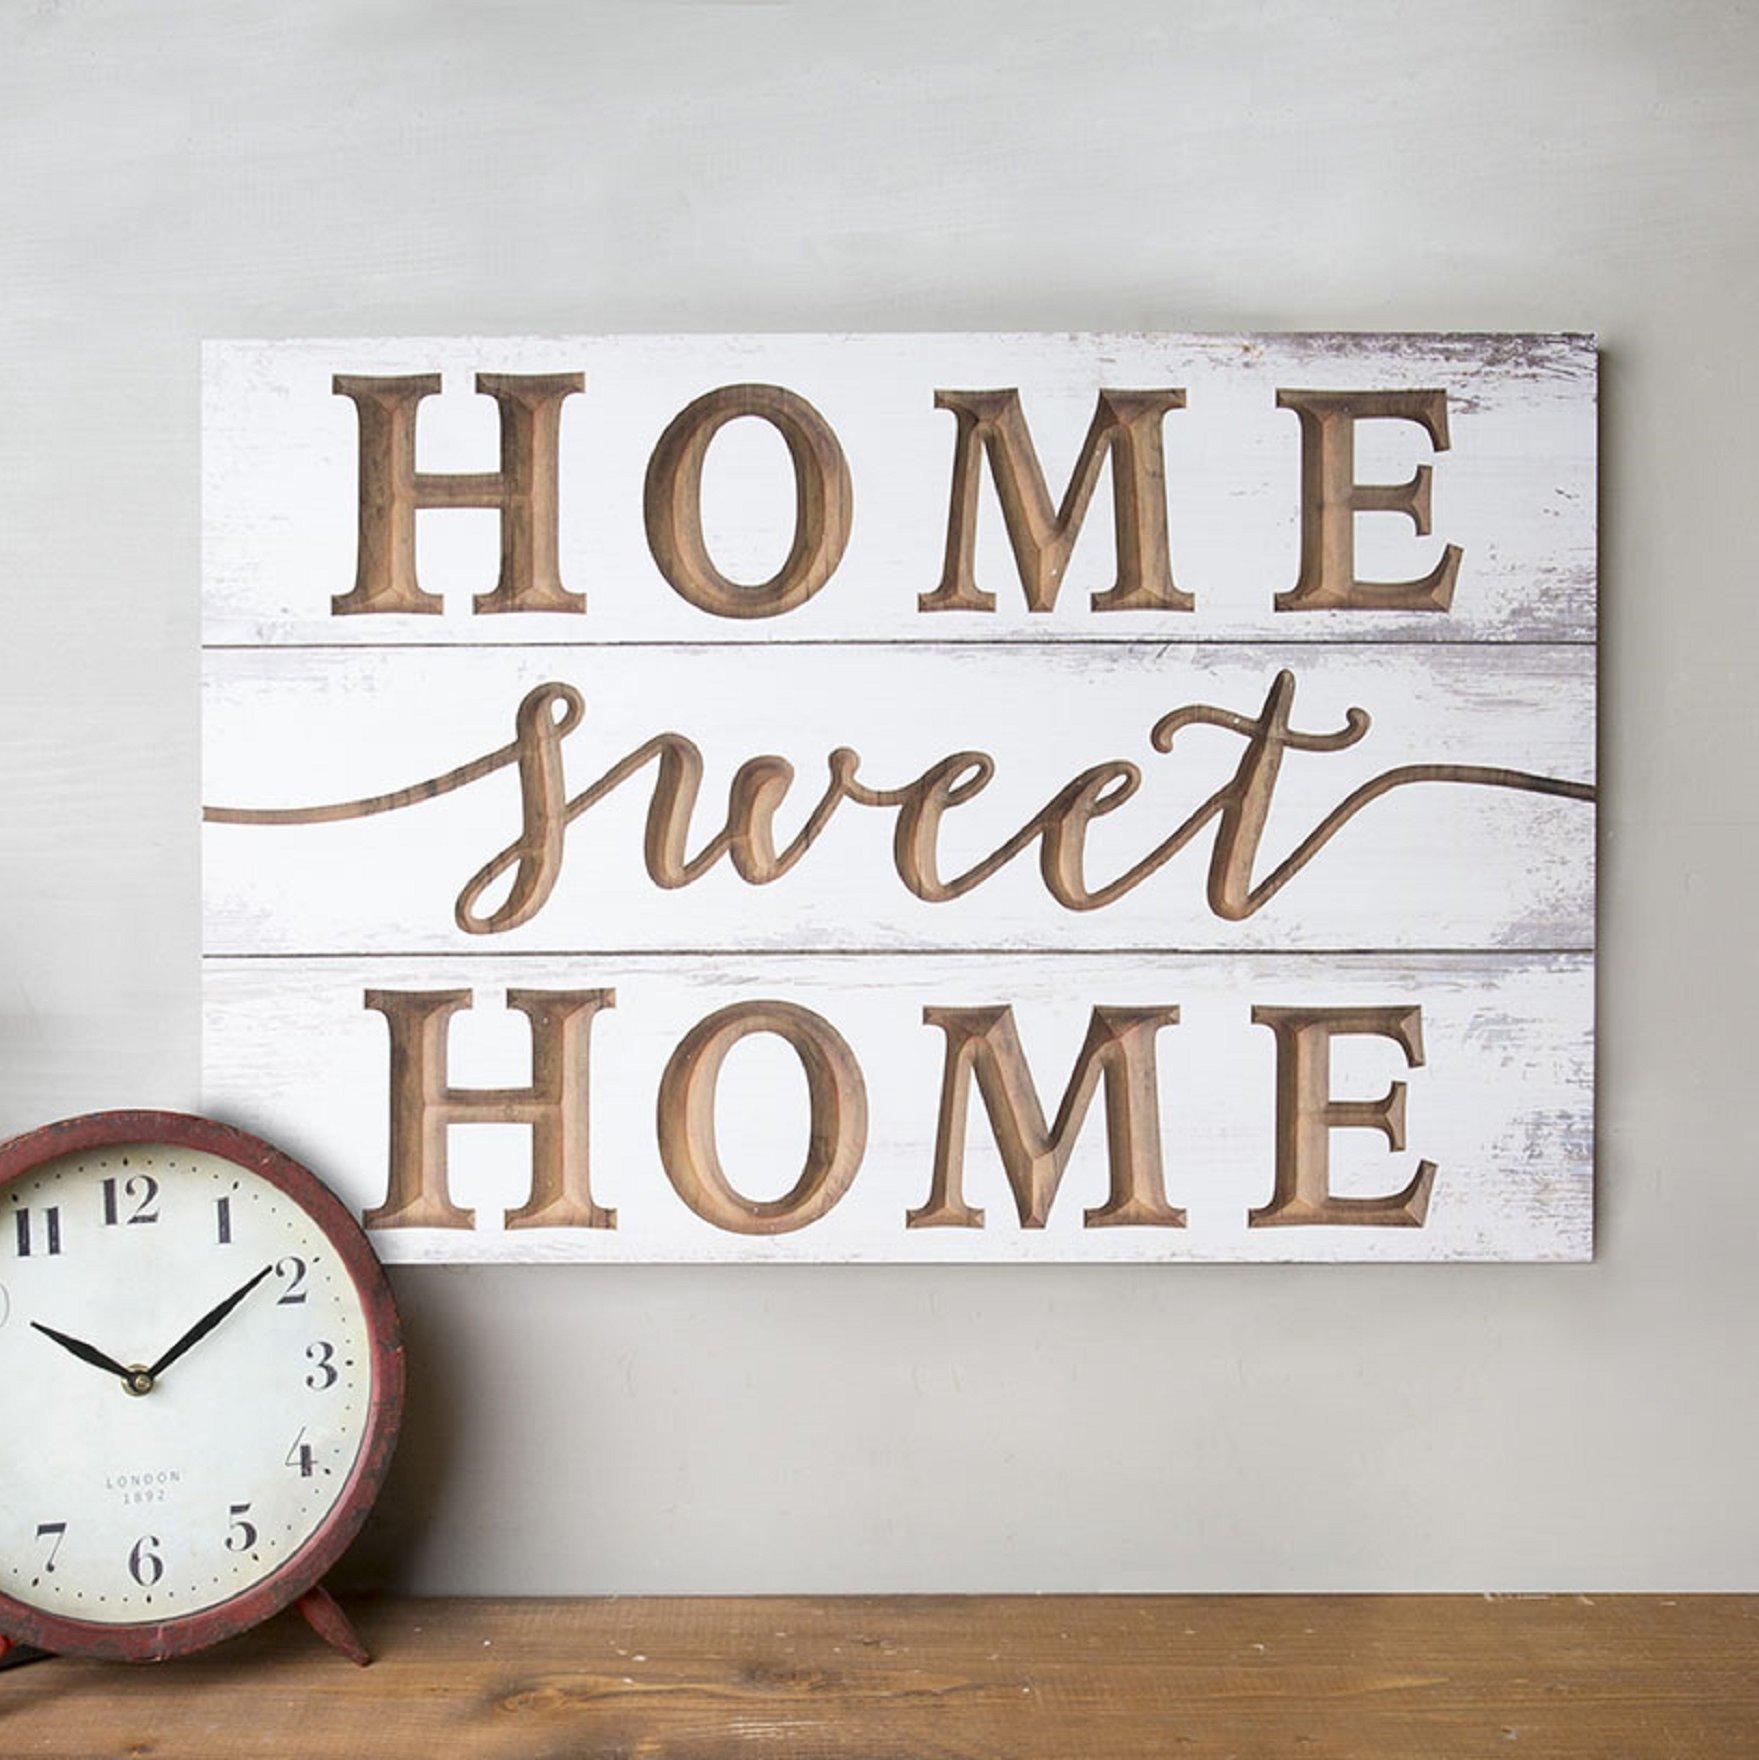 Home Sweet Home Wall Decor   Wayfair Regarding Laser Engraved Home Sweet Home Wall Decor (View 3 of 30)